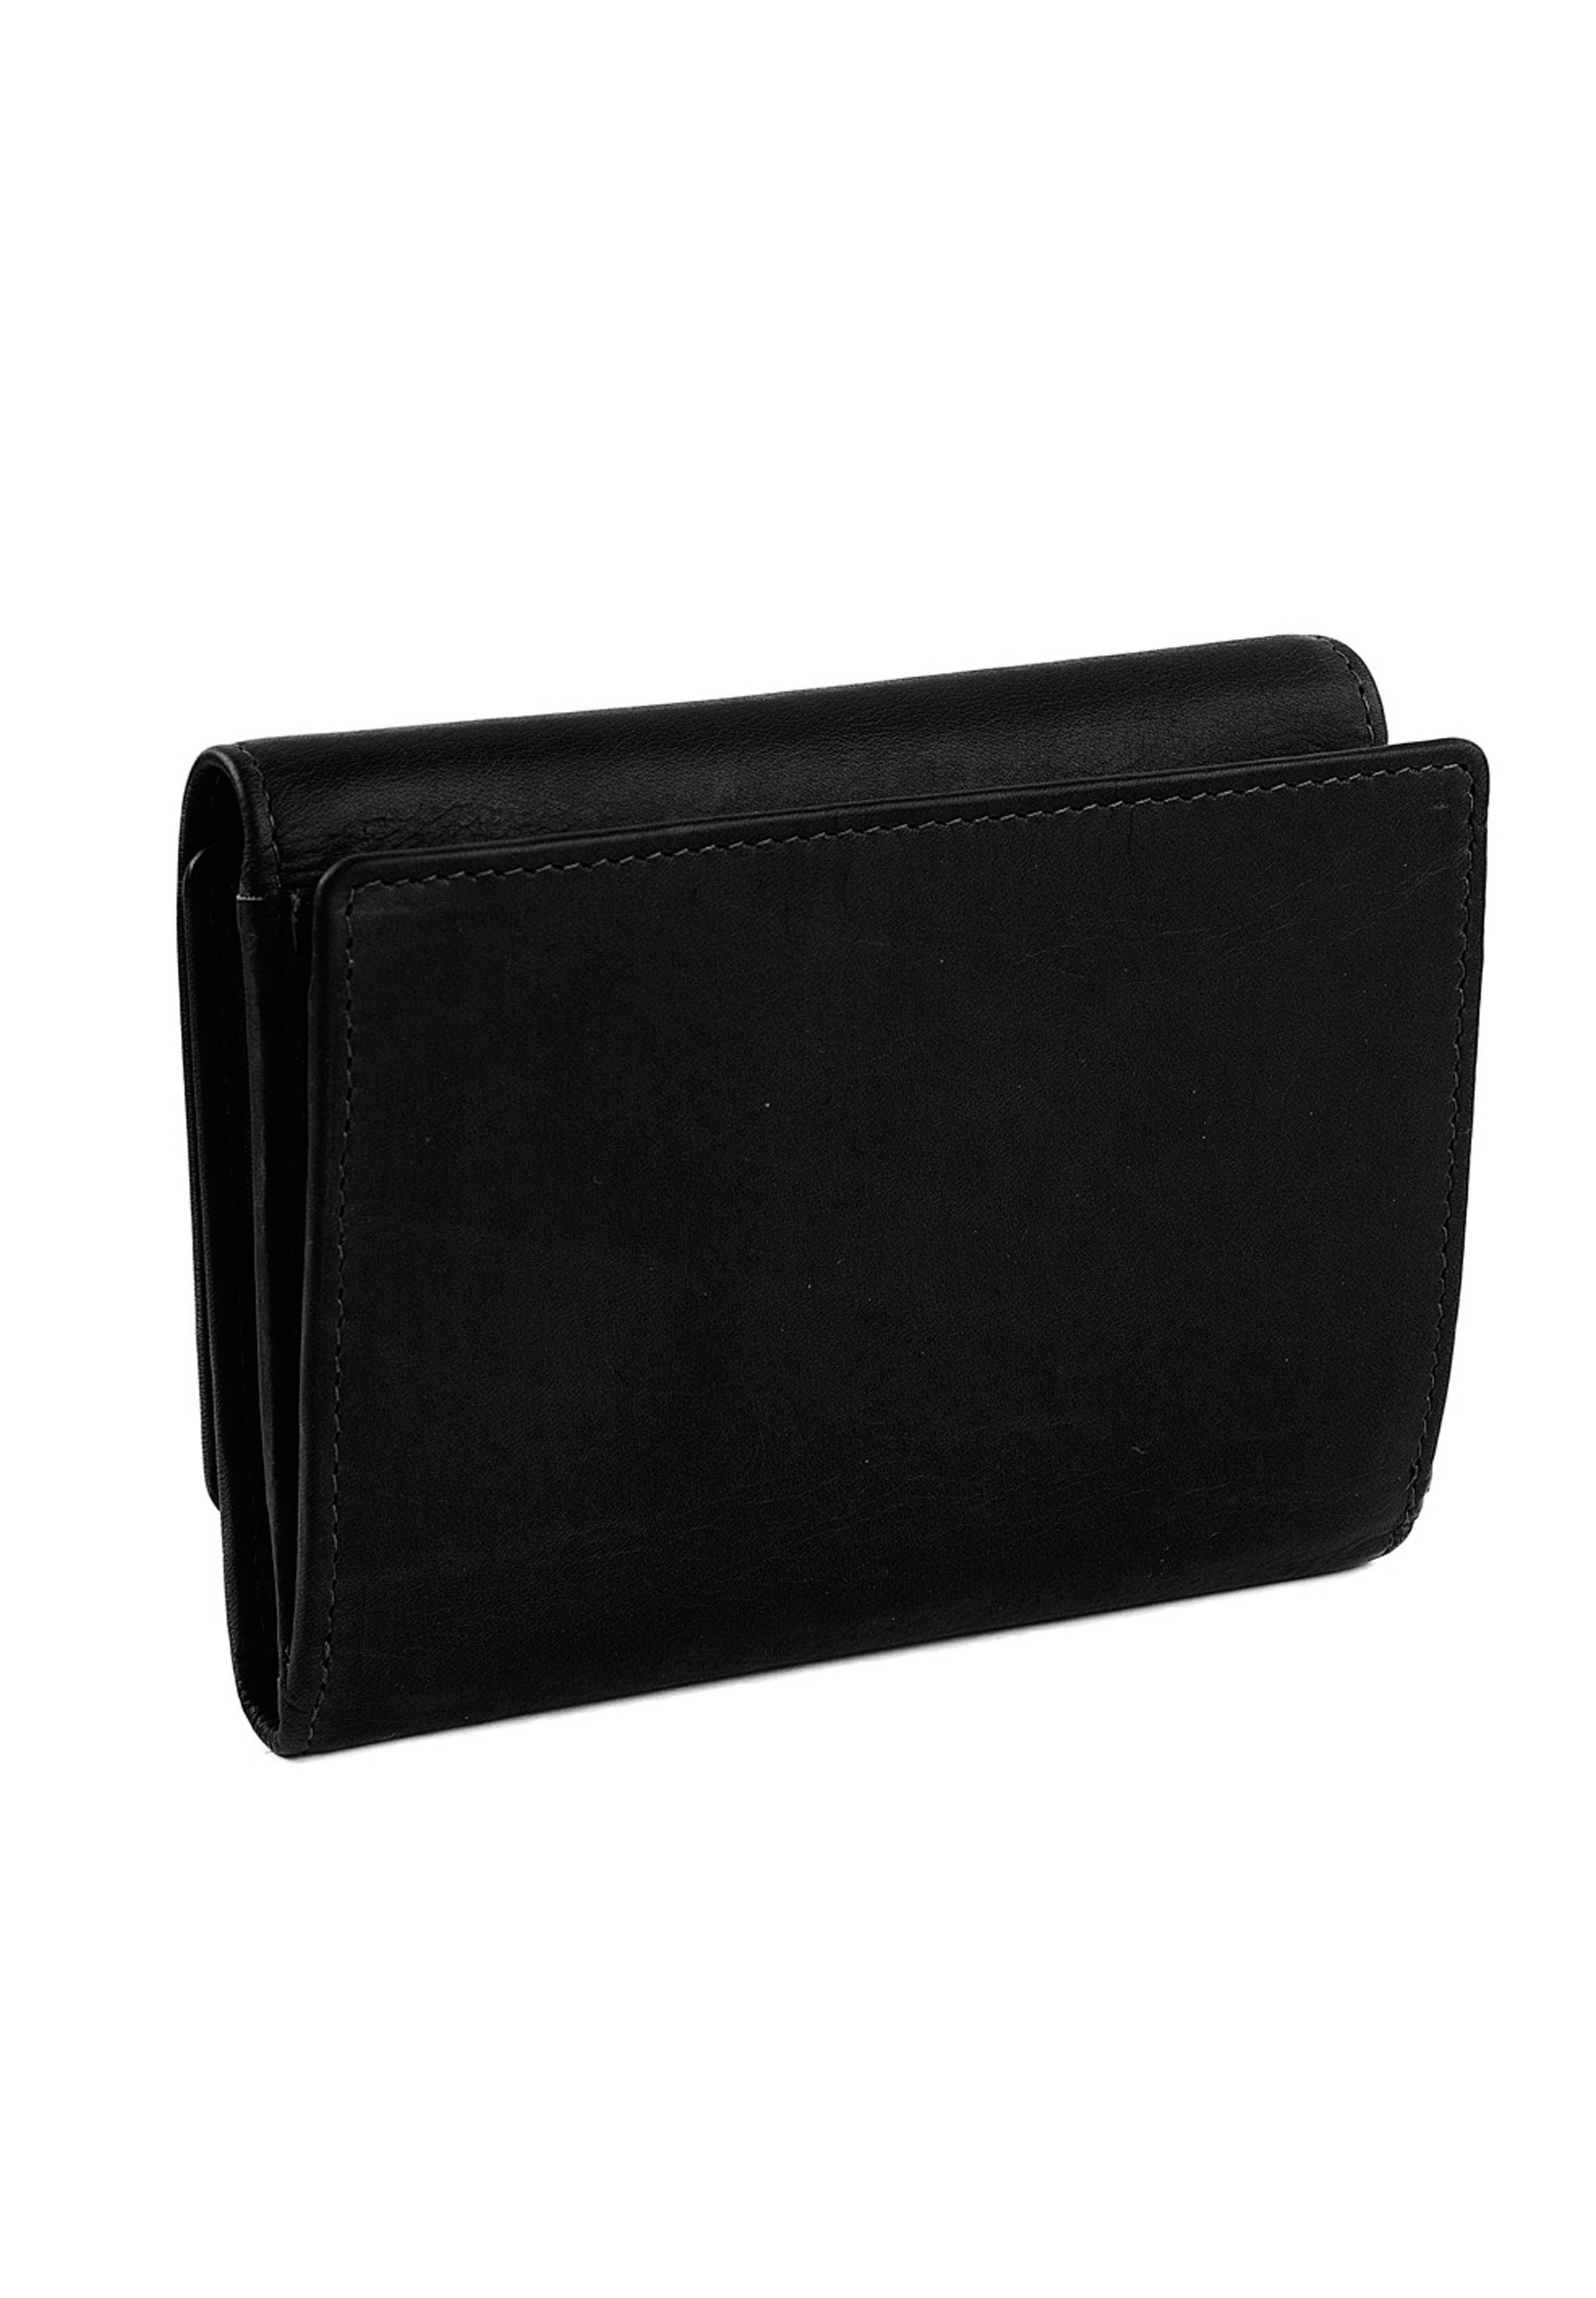 Damen RFID - Geldbörse